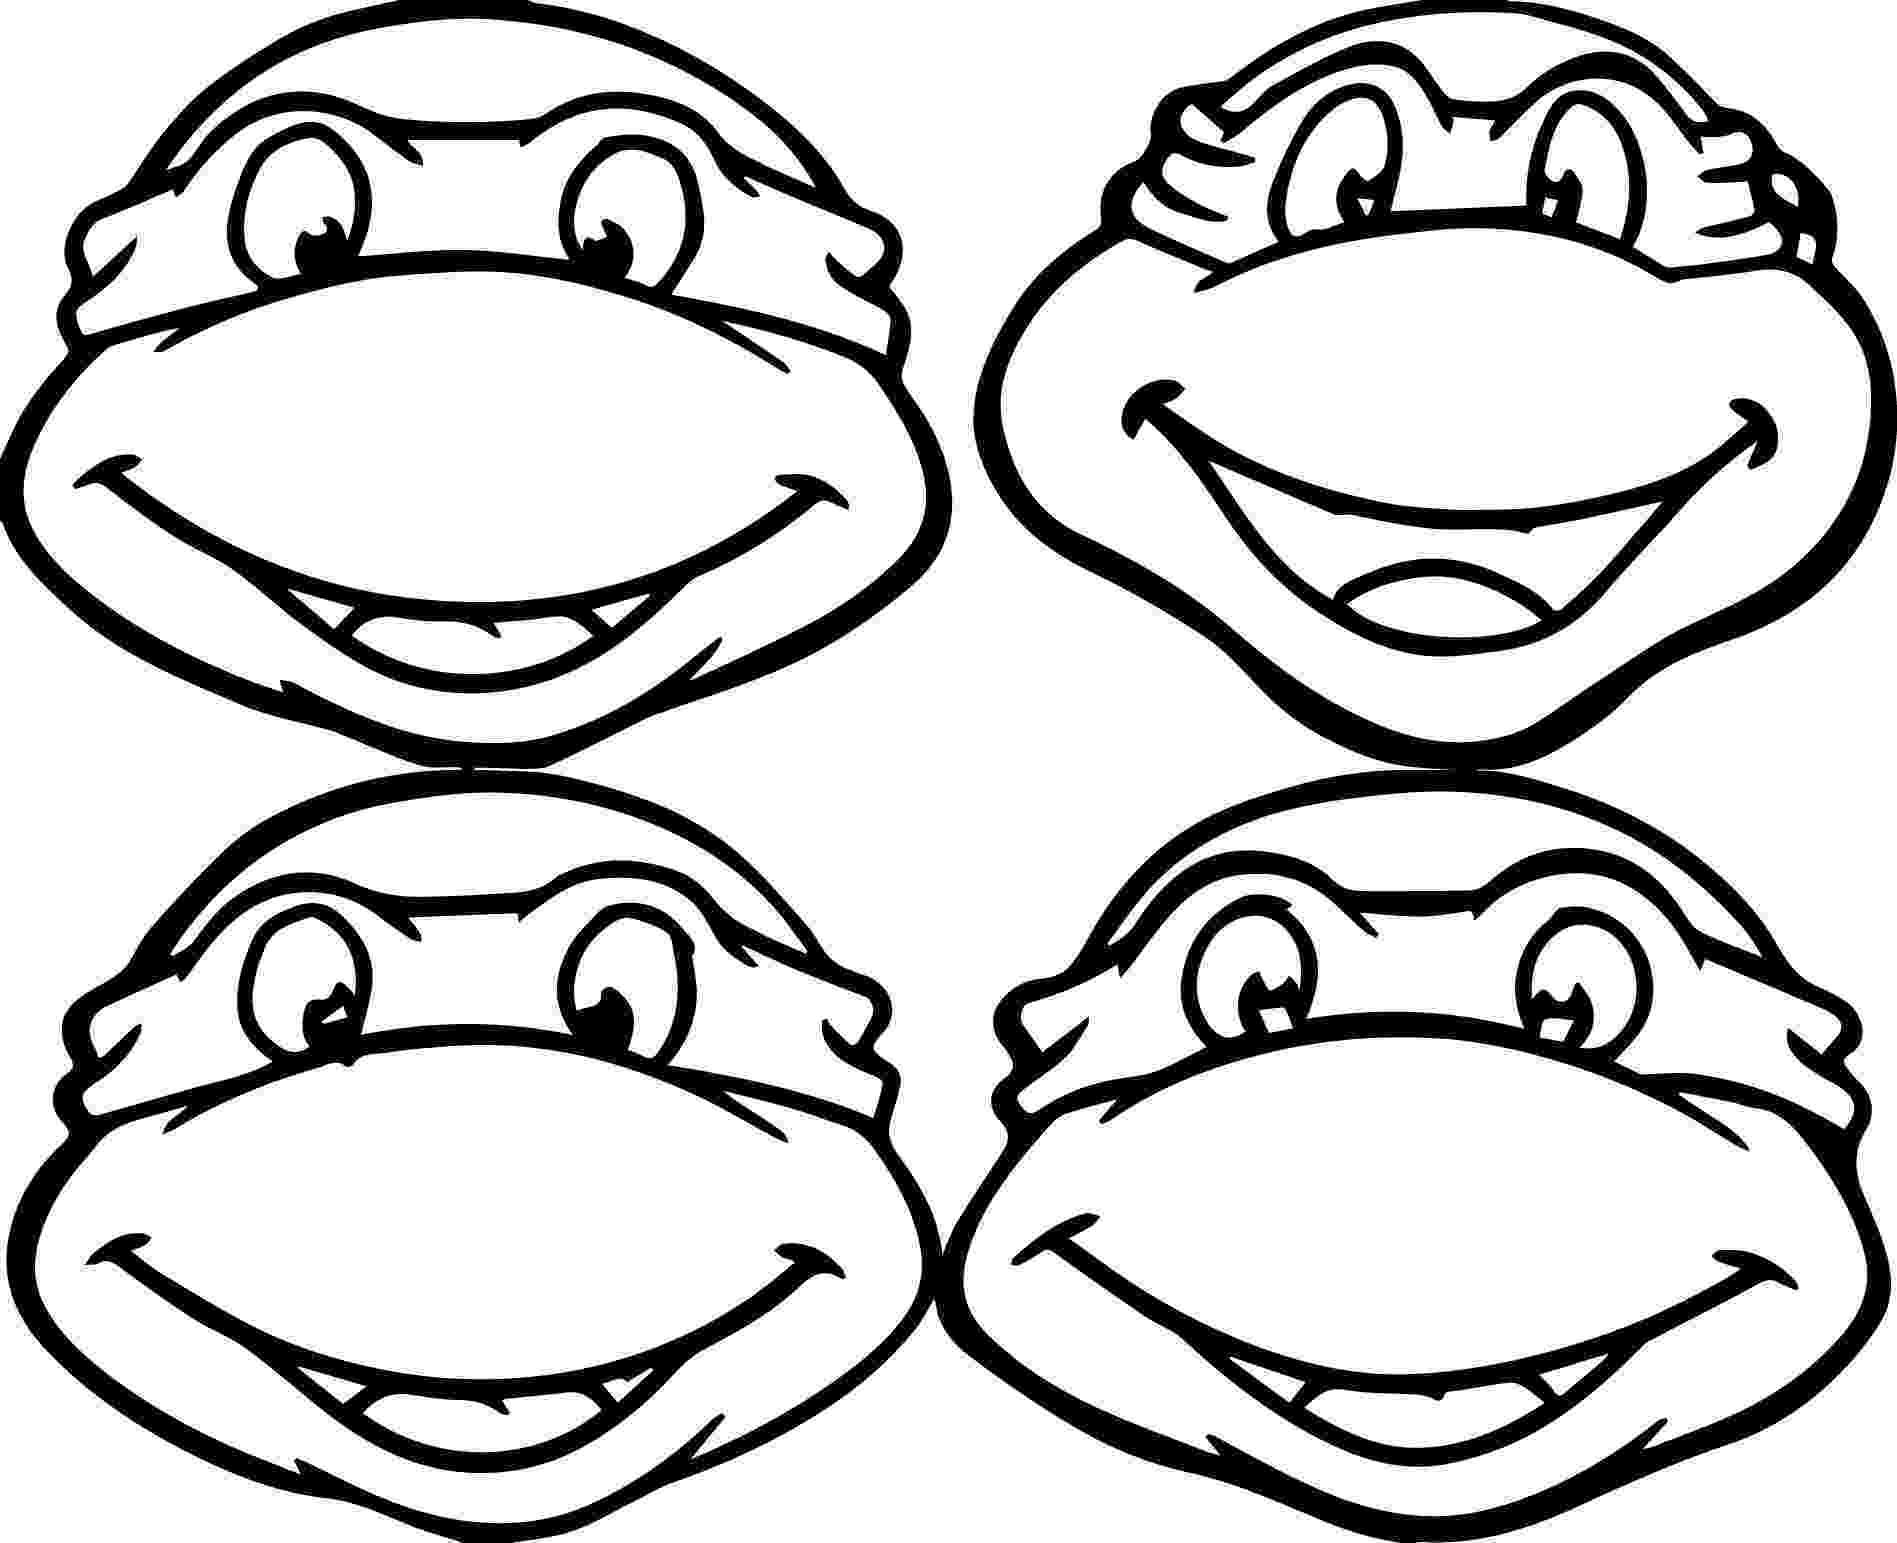 colouring pages ninja turtles craftoholic teenage mutant ninja turtles coloring pages colouring pages ninja turtles